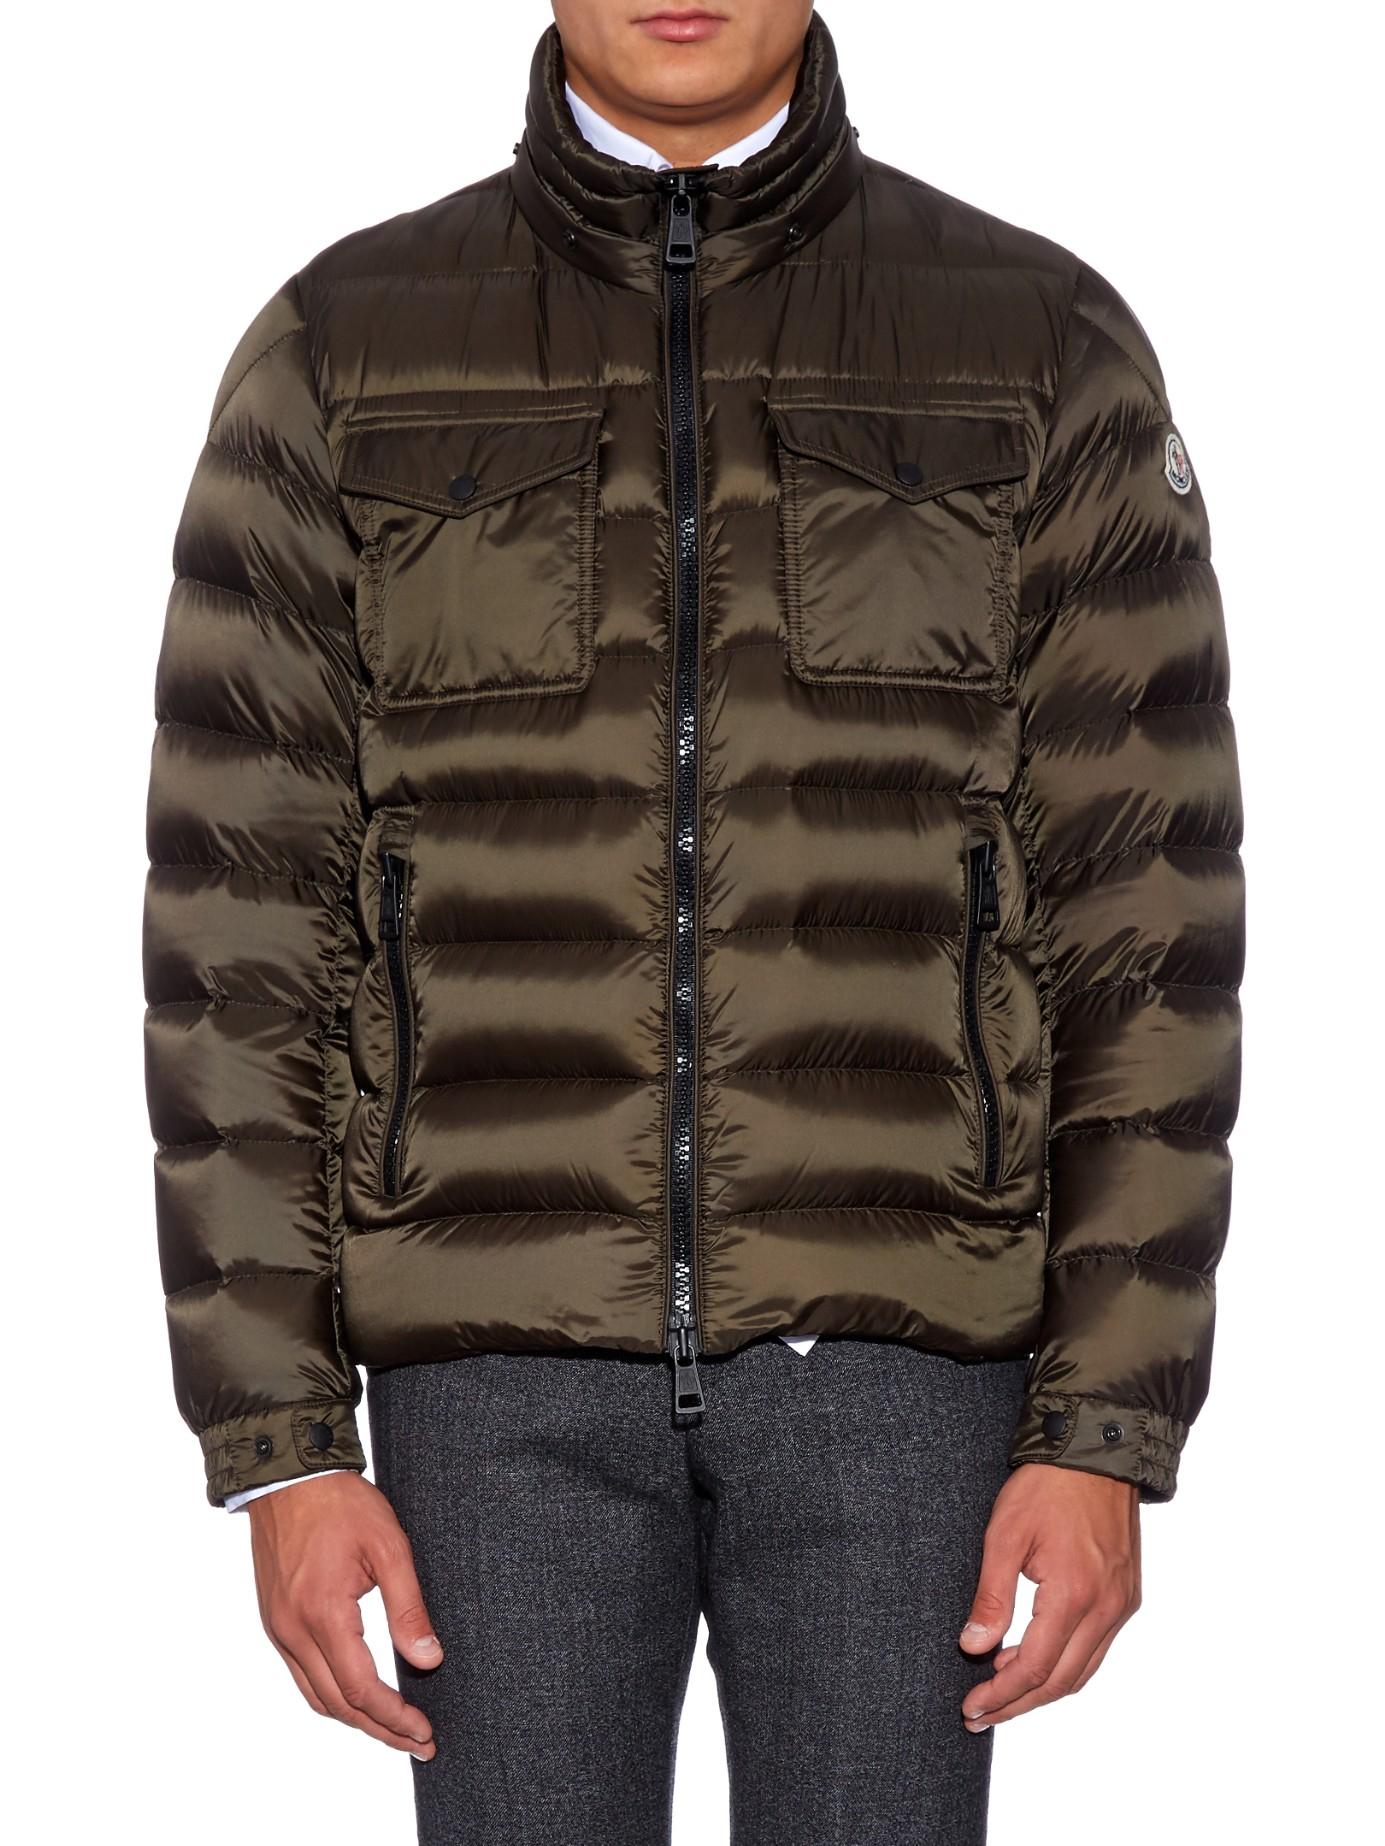 moncler edward jacket sale